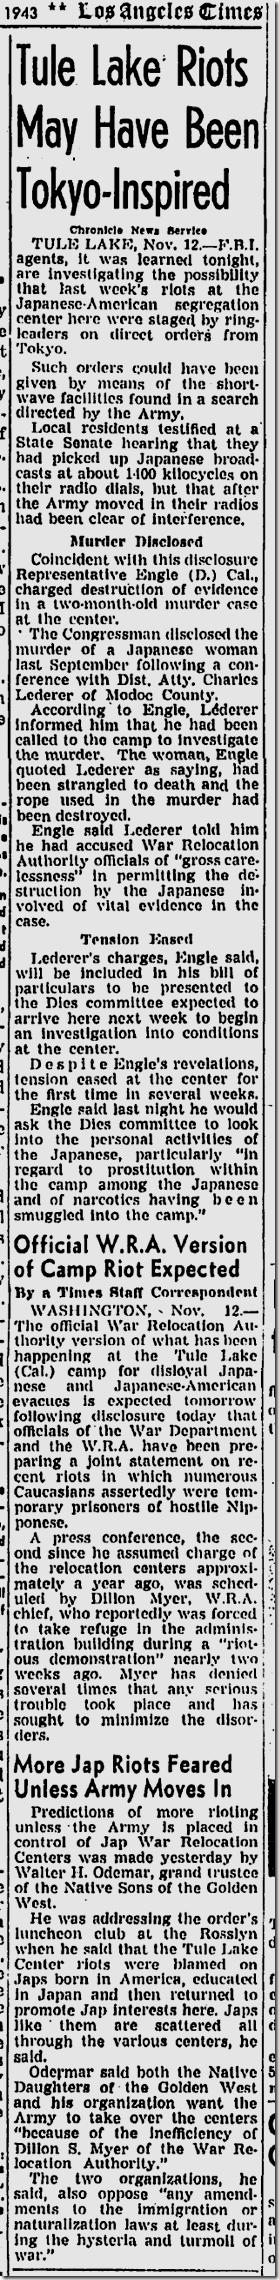 Nov. 13, 1943, Tule Lake